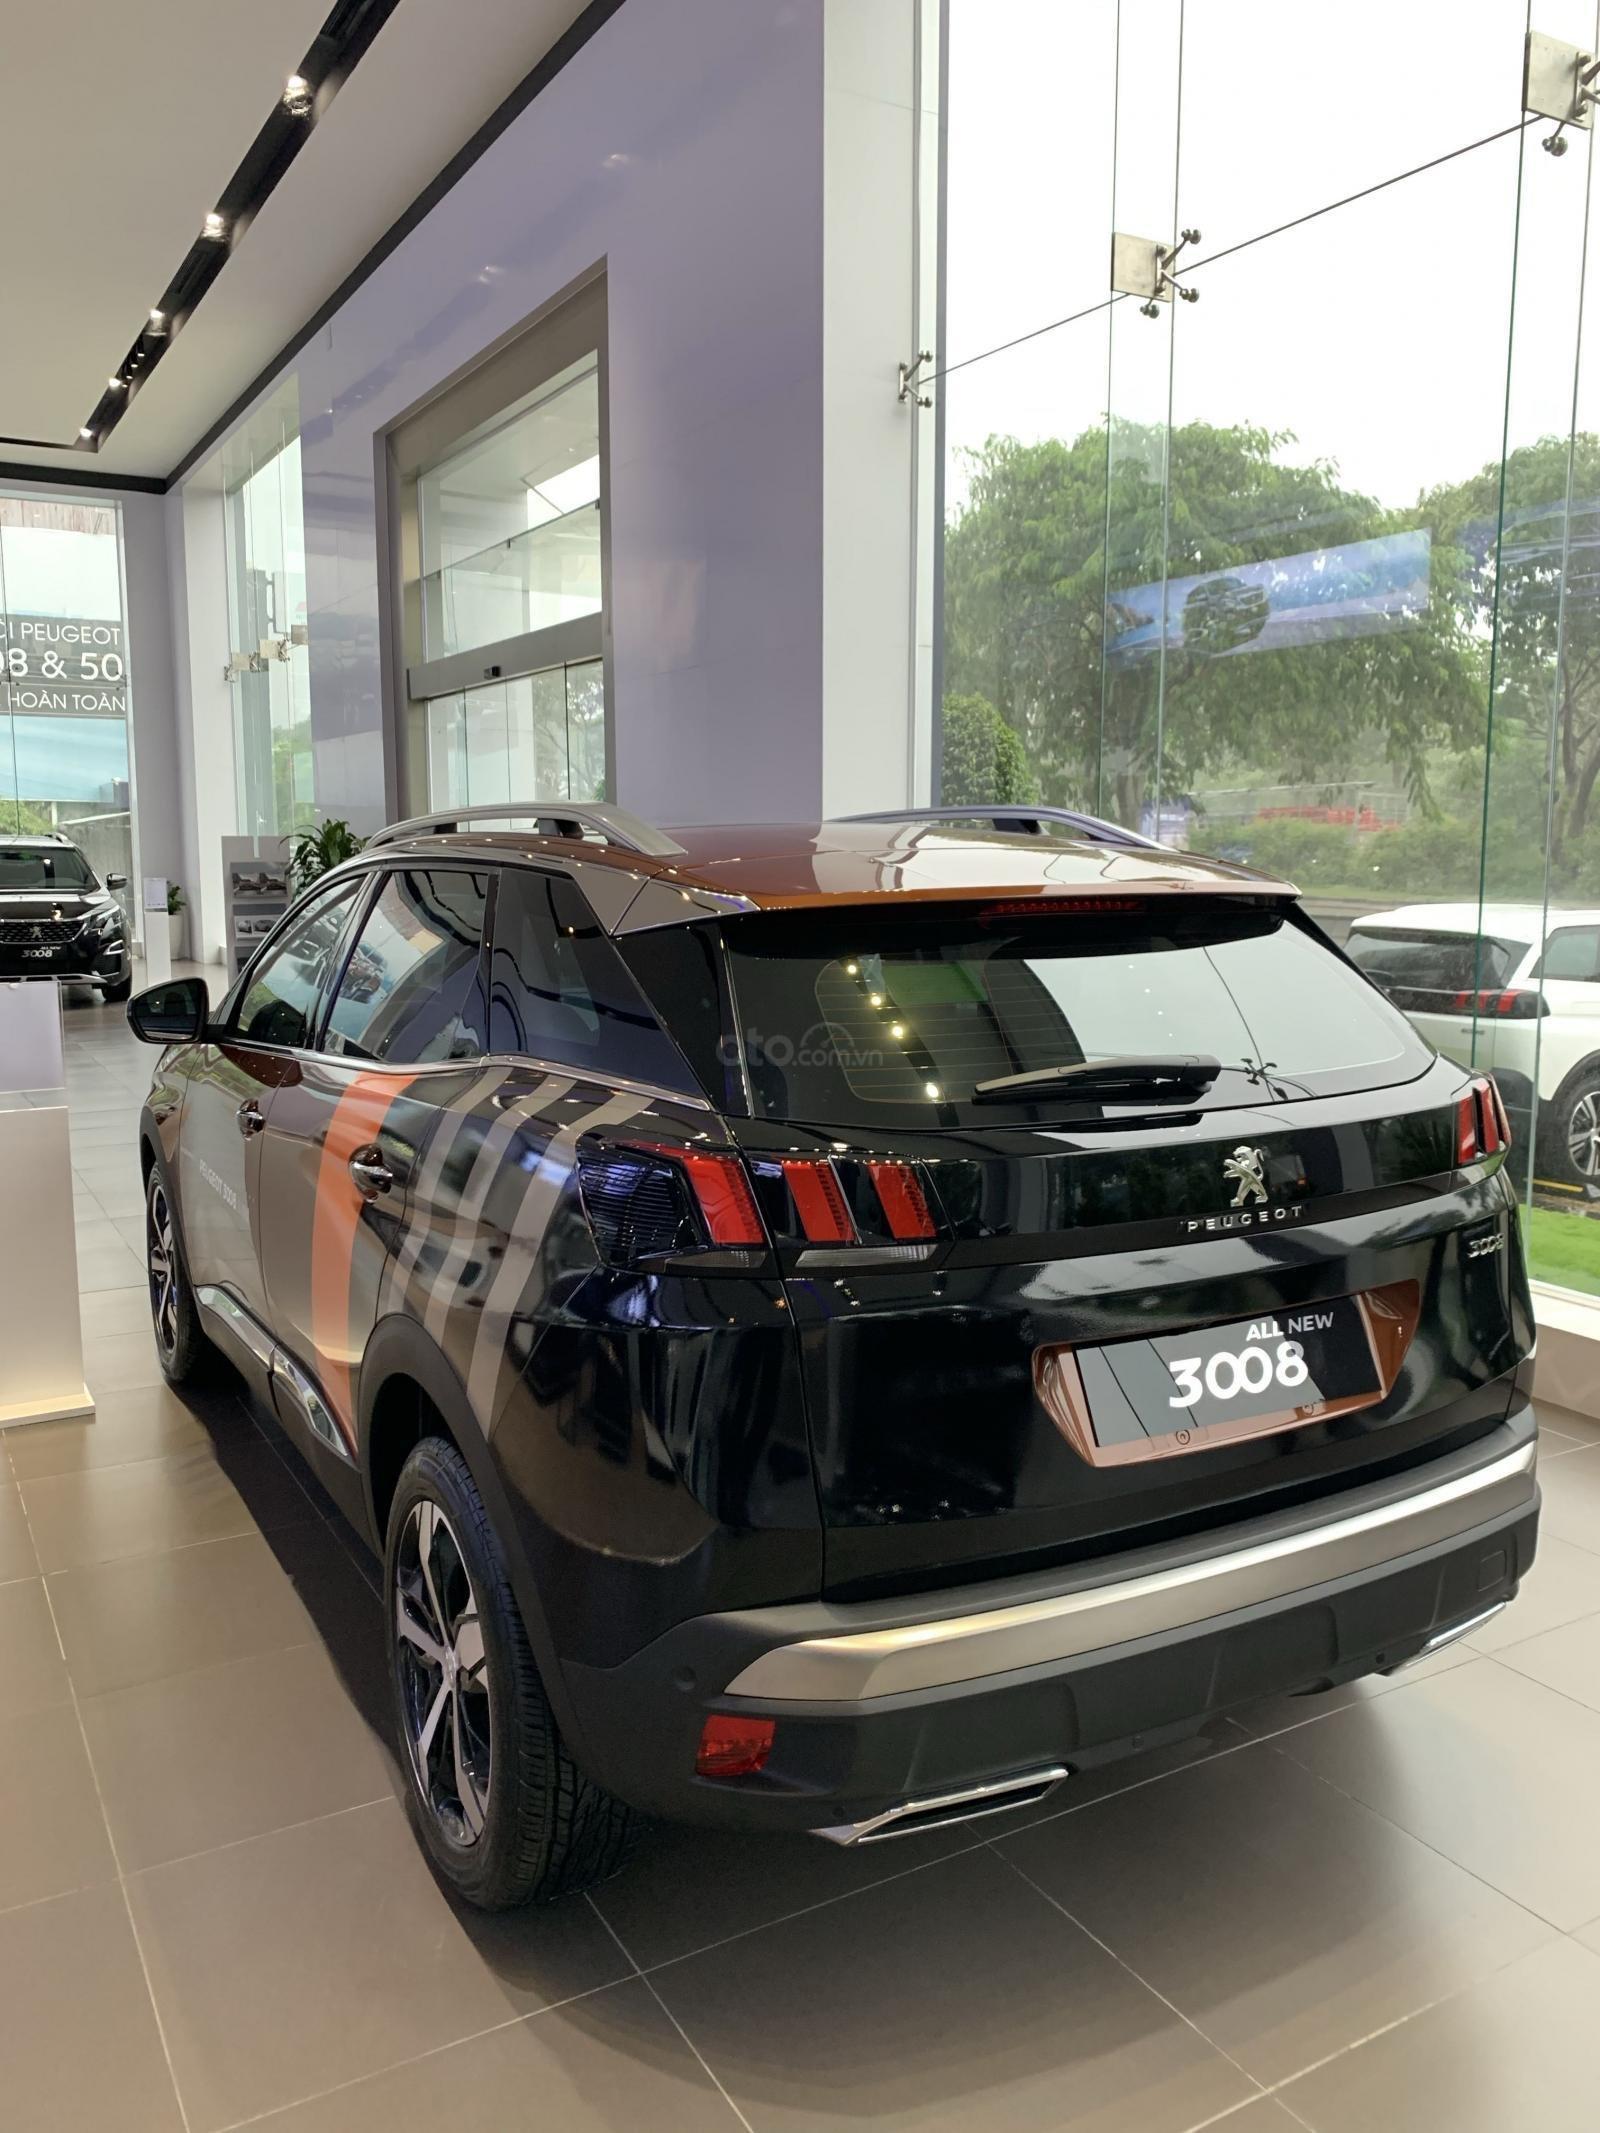 Peugeot3008 All new 2019 ưu đãi hấp dẫn (6)